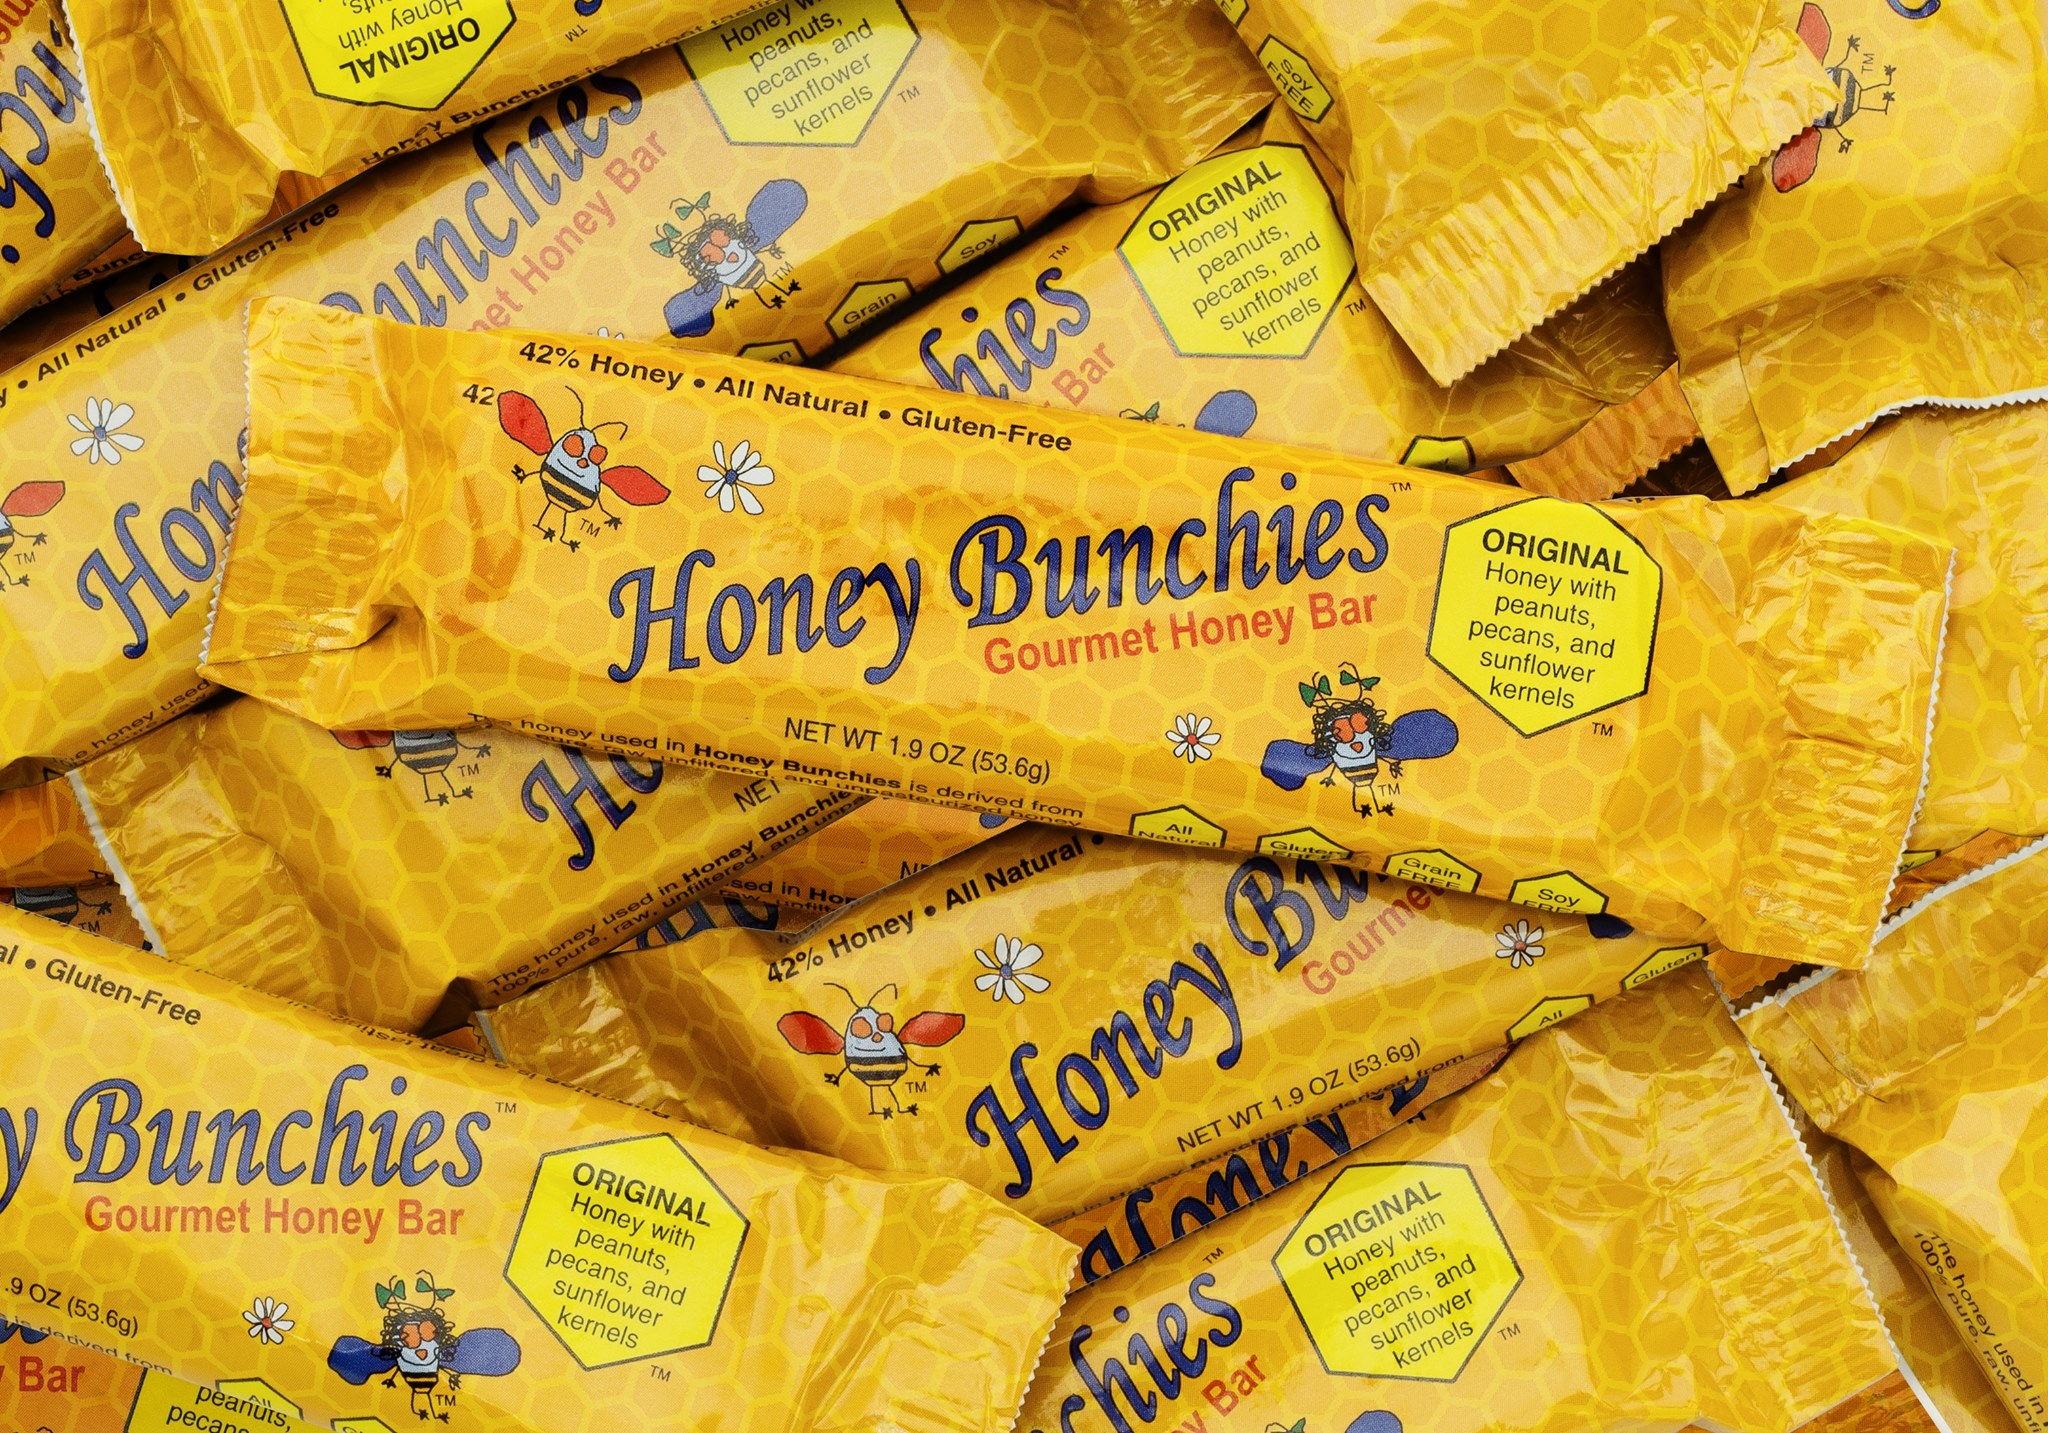 Honey Bunchies Energy Bar